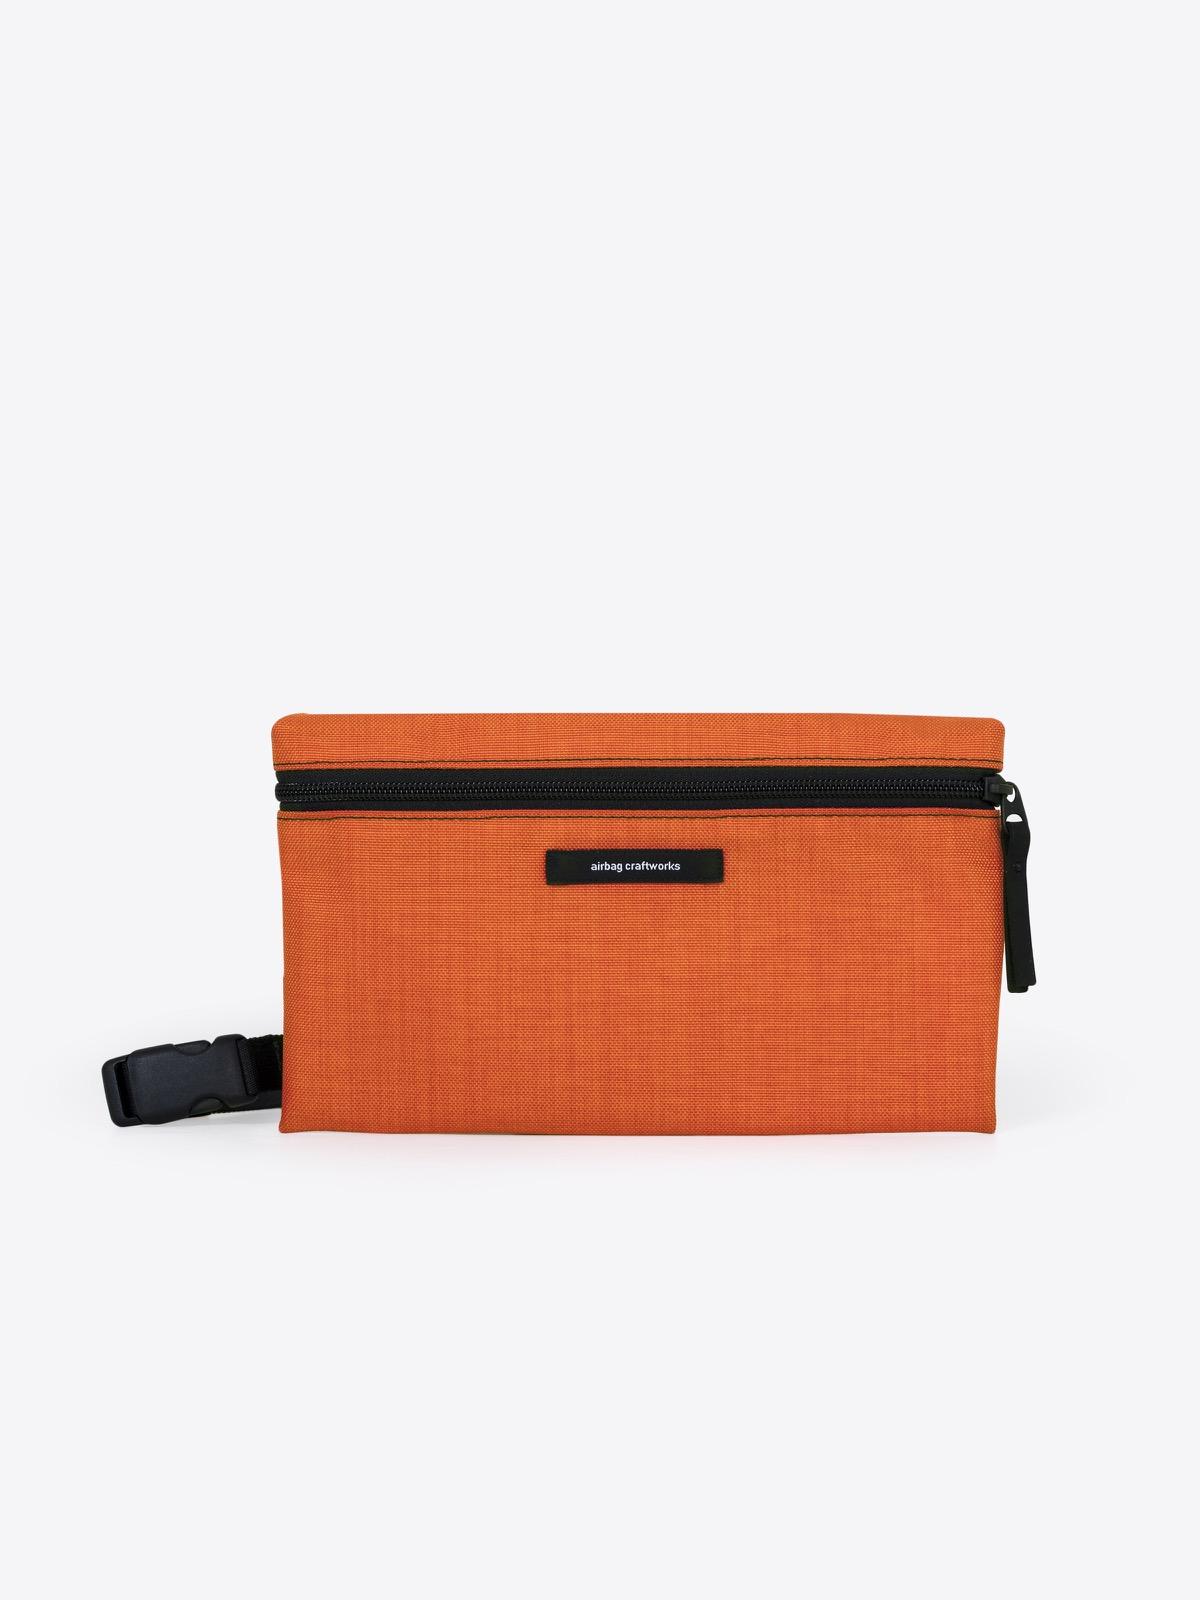 A2 orange